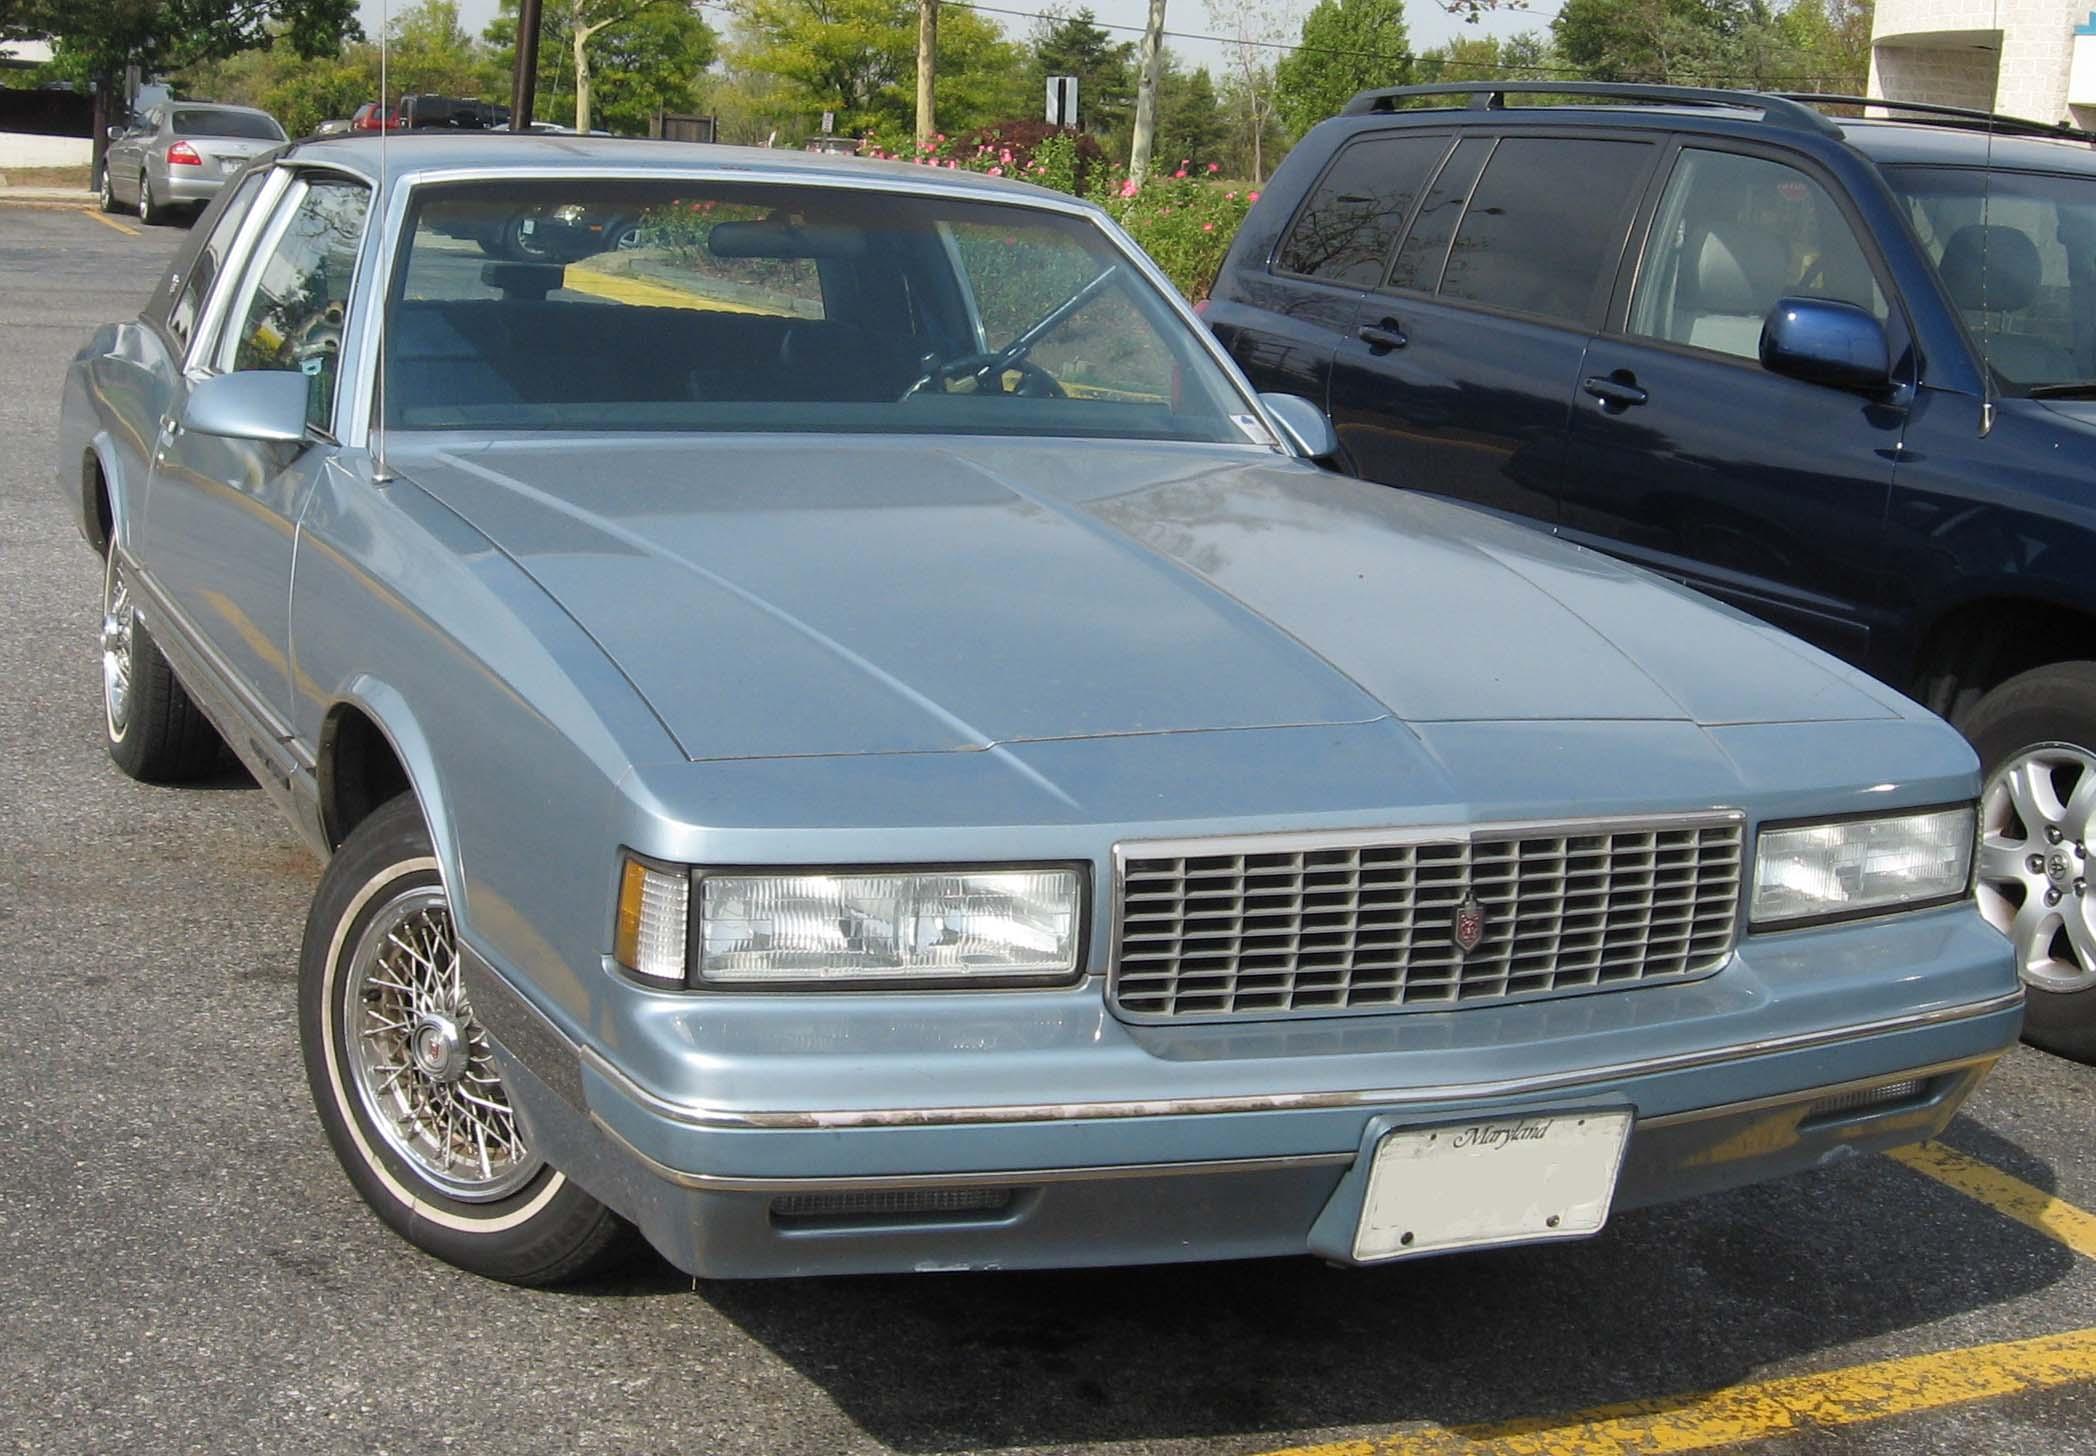 Chevy monte carlo luxury sport